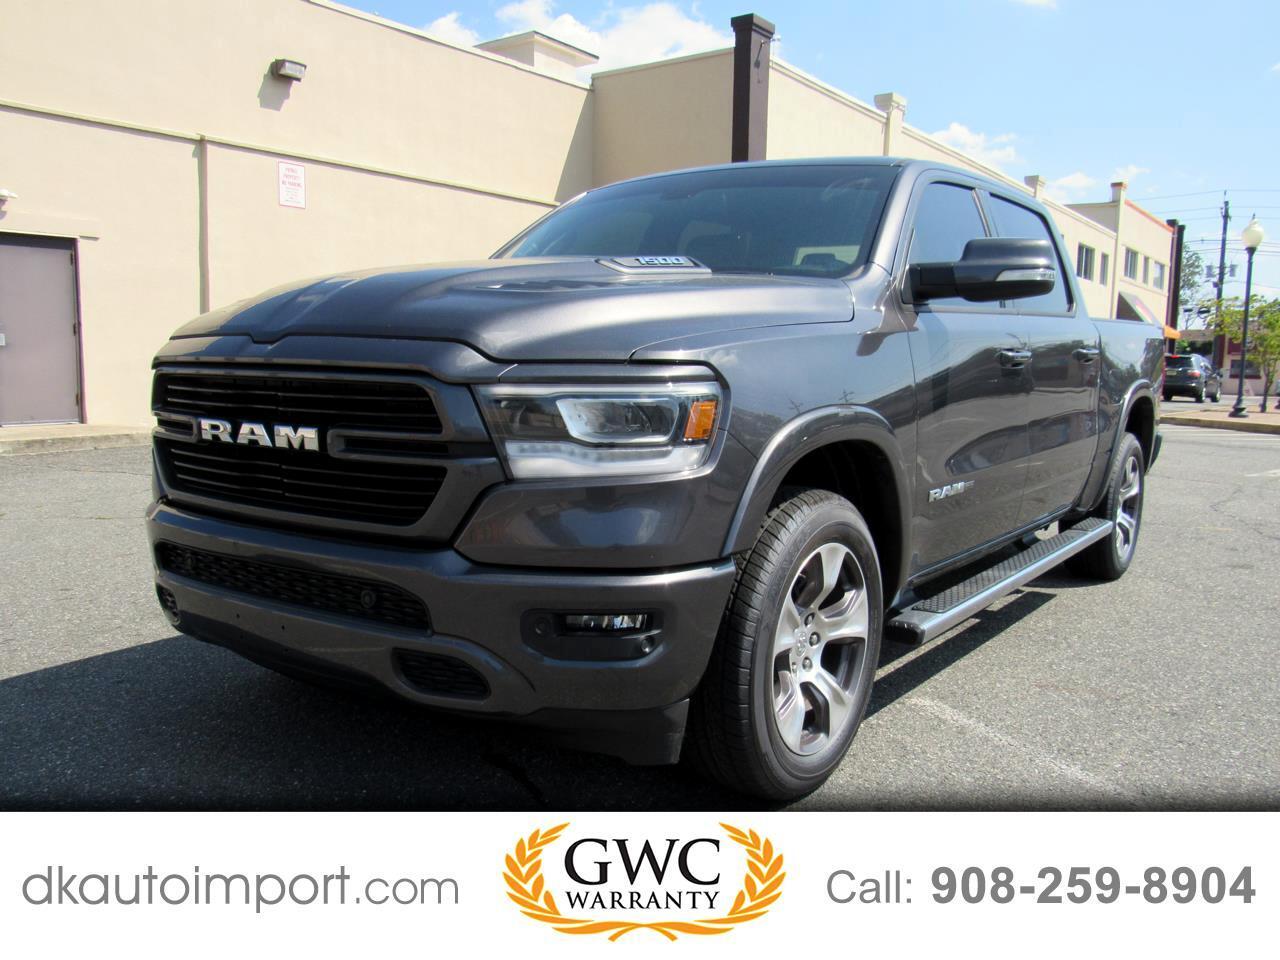 RAM 1500 Laramie Crew Cab SWB 4WD 2019